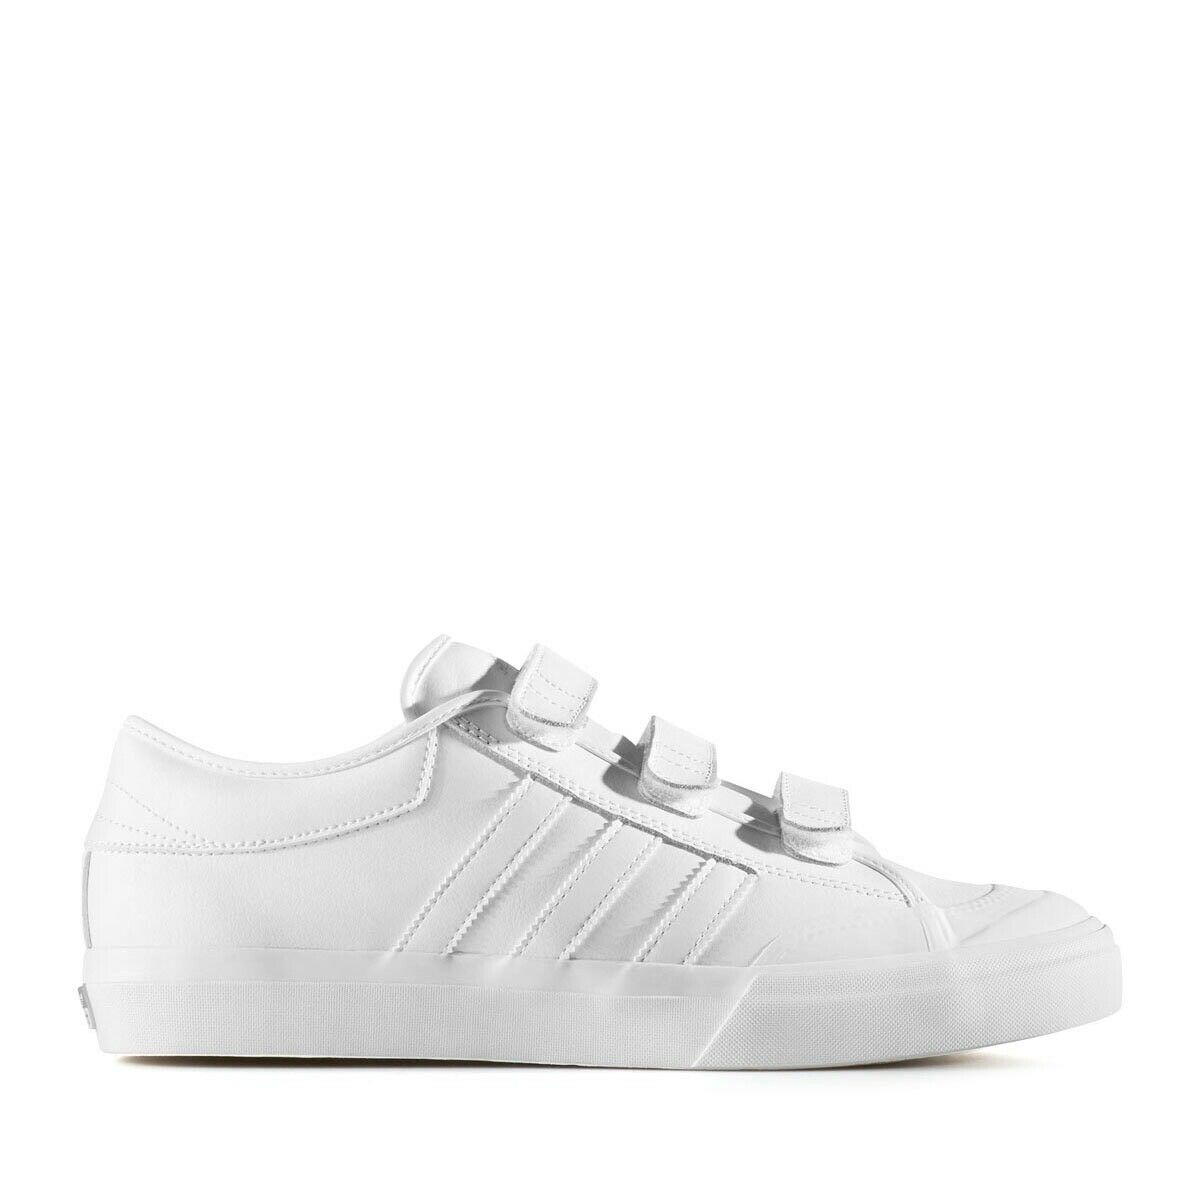 [Adidas] CG4510 Matchcourt CF Men Women Running shoes Sneakers White